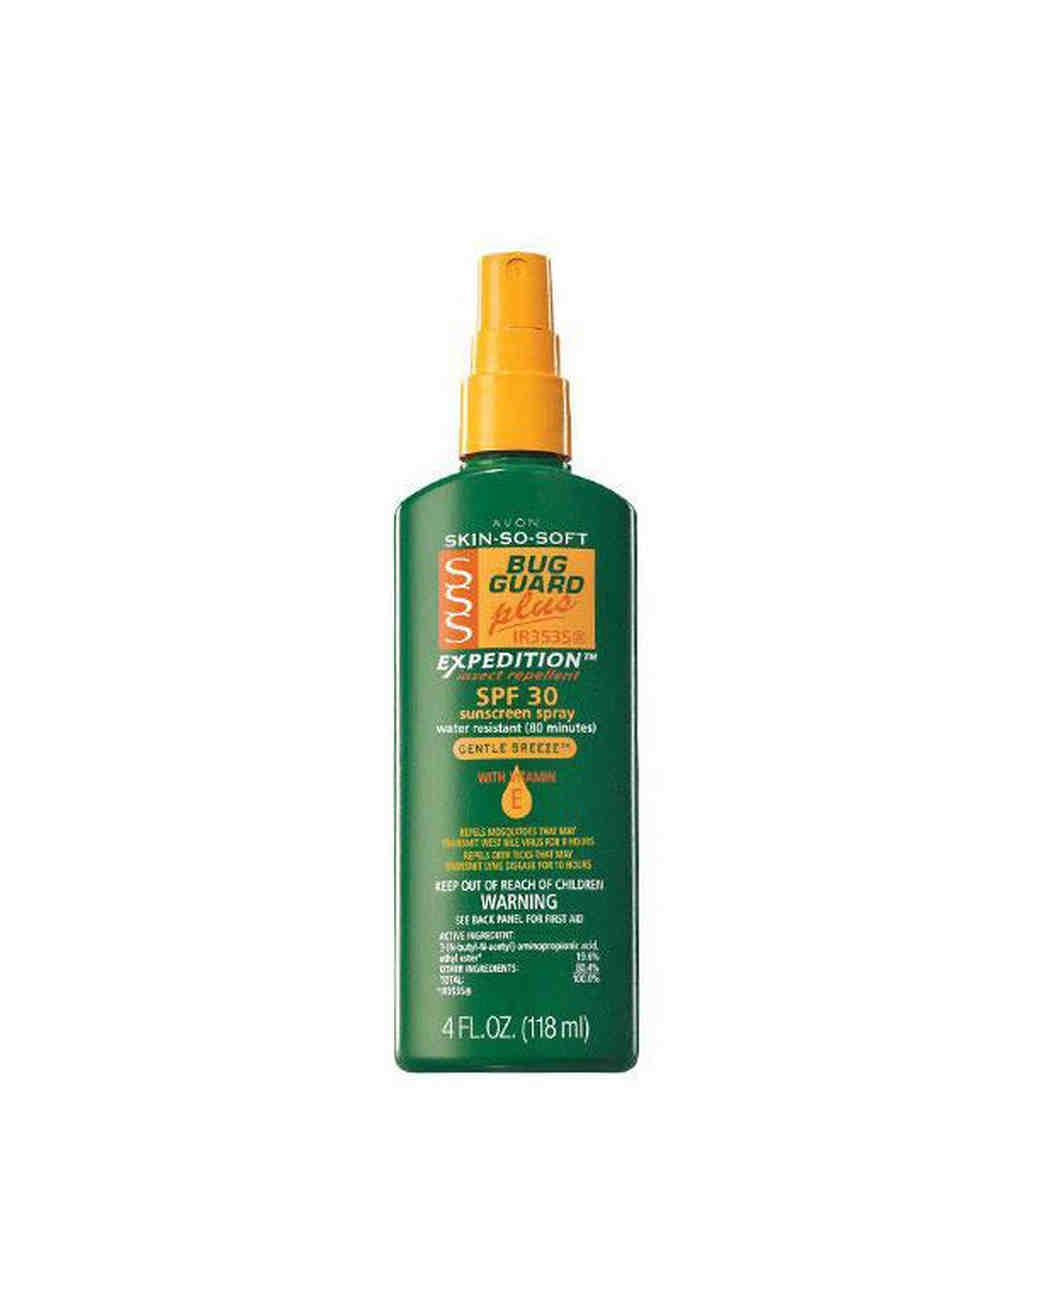 Avon Skin-So-Soft Bug Guard Plus SPF